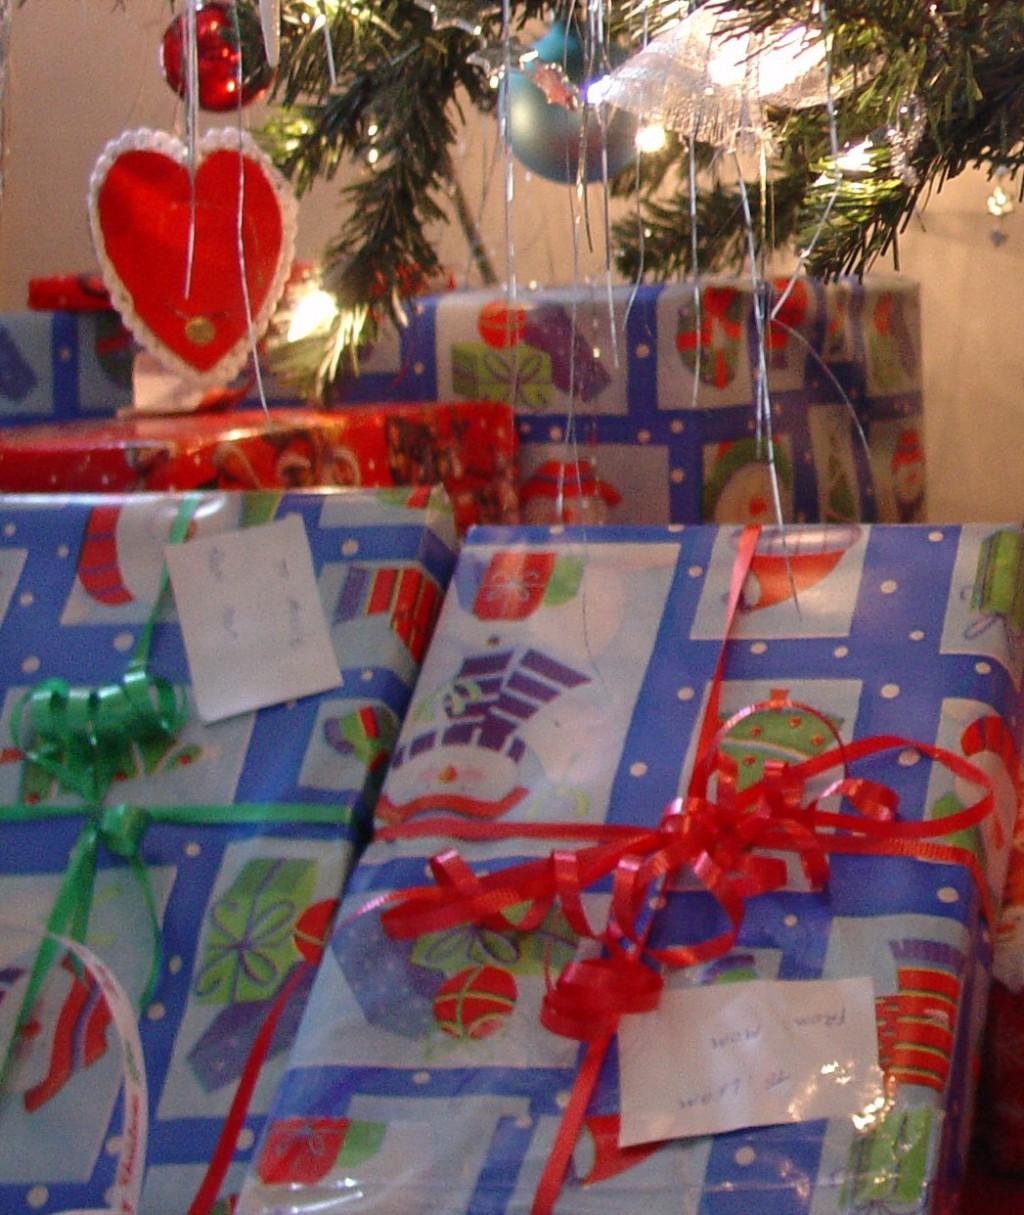 Christmas Gift Ideas For Teenage Girls: Christmas Gift Ideas For Teenage Girls